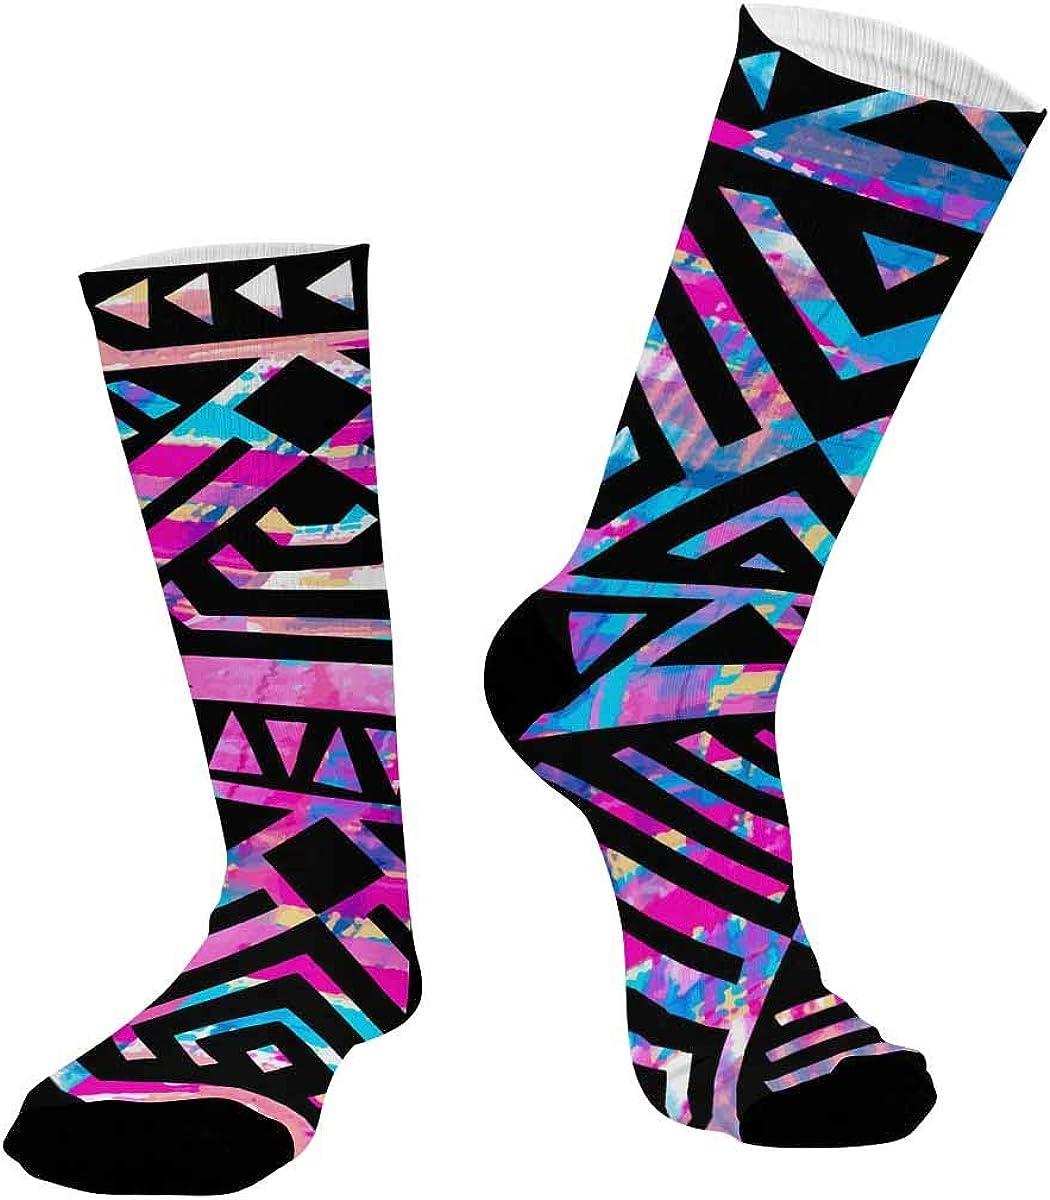 INTERESTPRINT Sublimated Crew Casual Athletic Socks Boho Textile Pattern